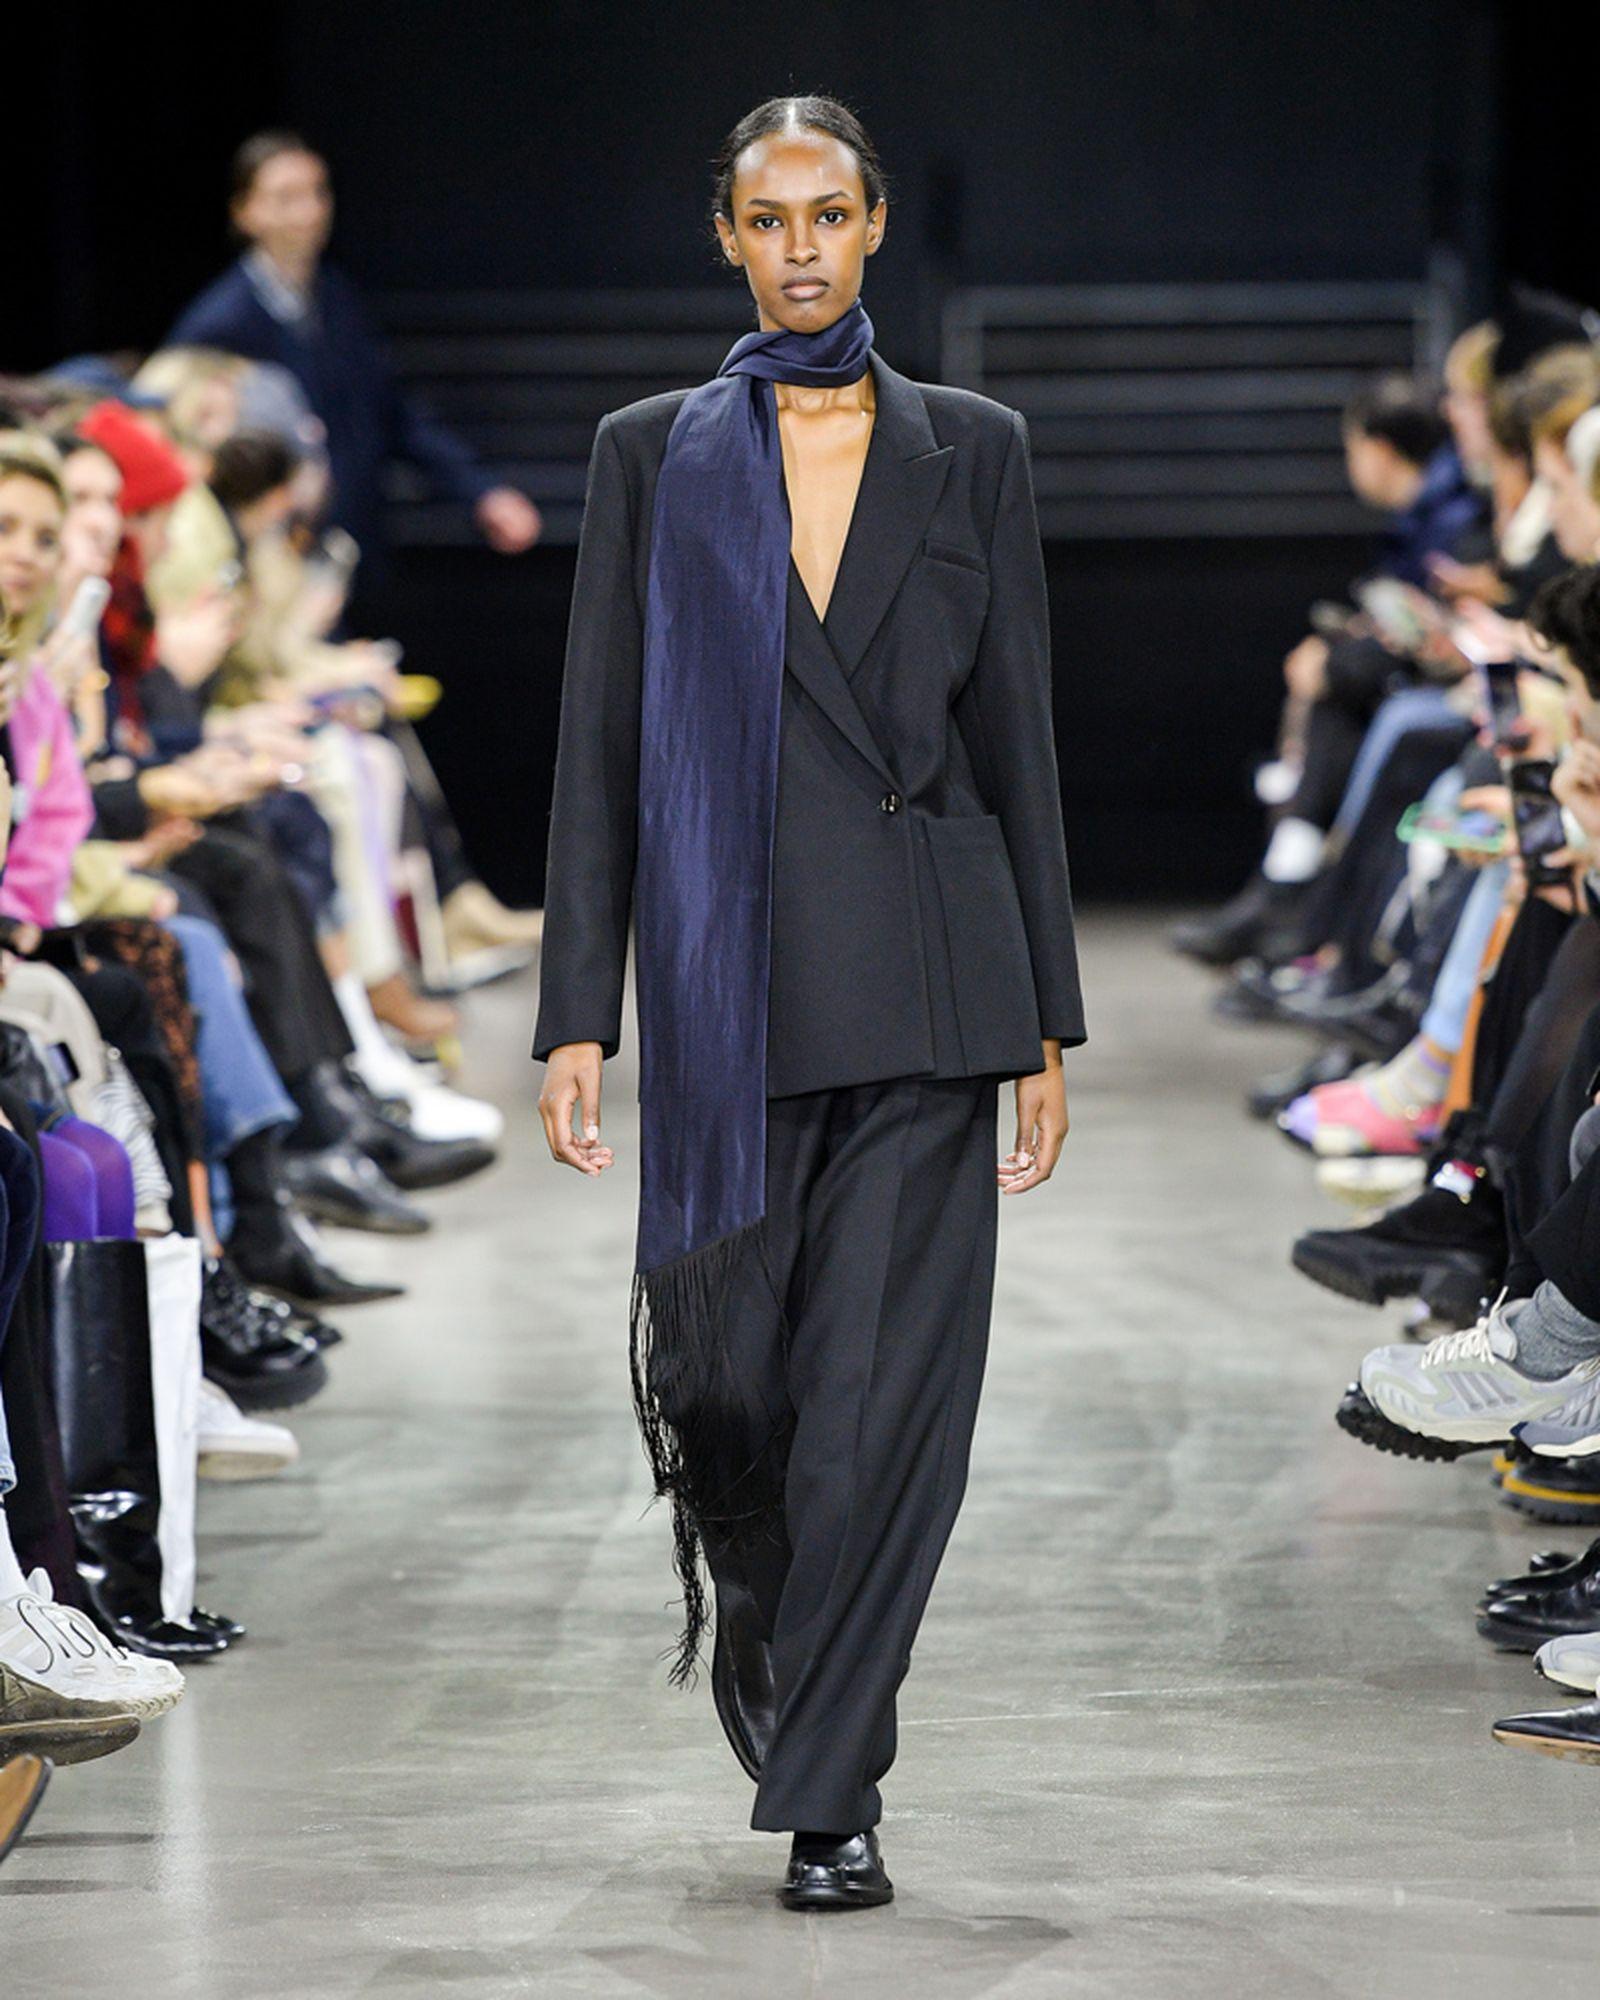 future-fashion-week-copenhagen-soulland-3